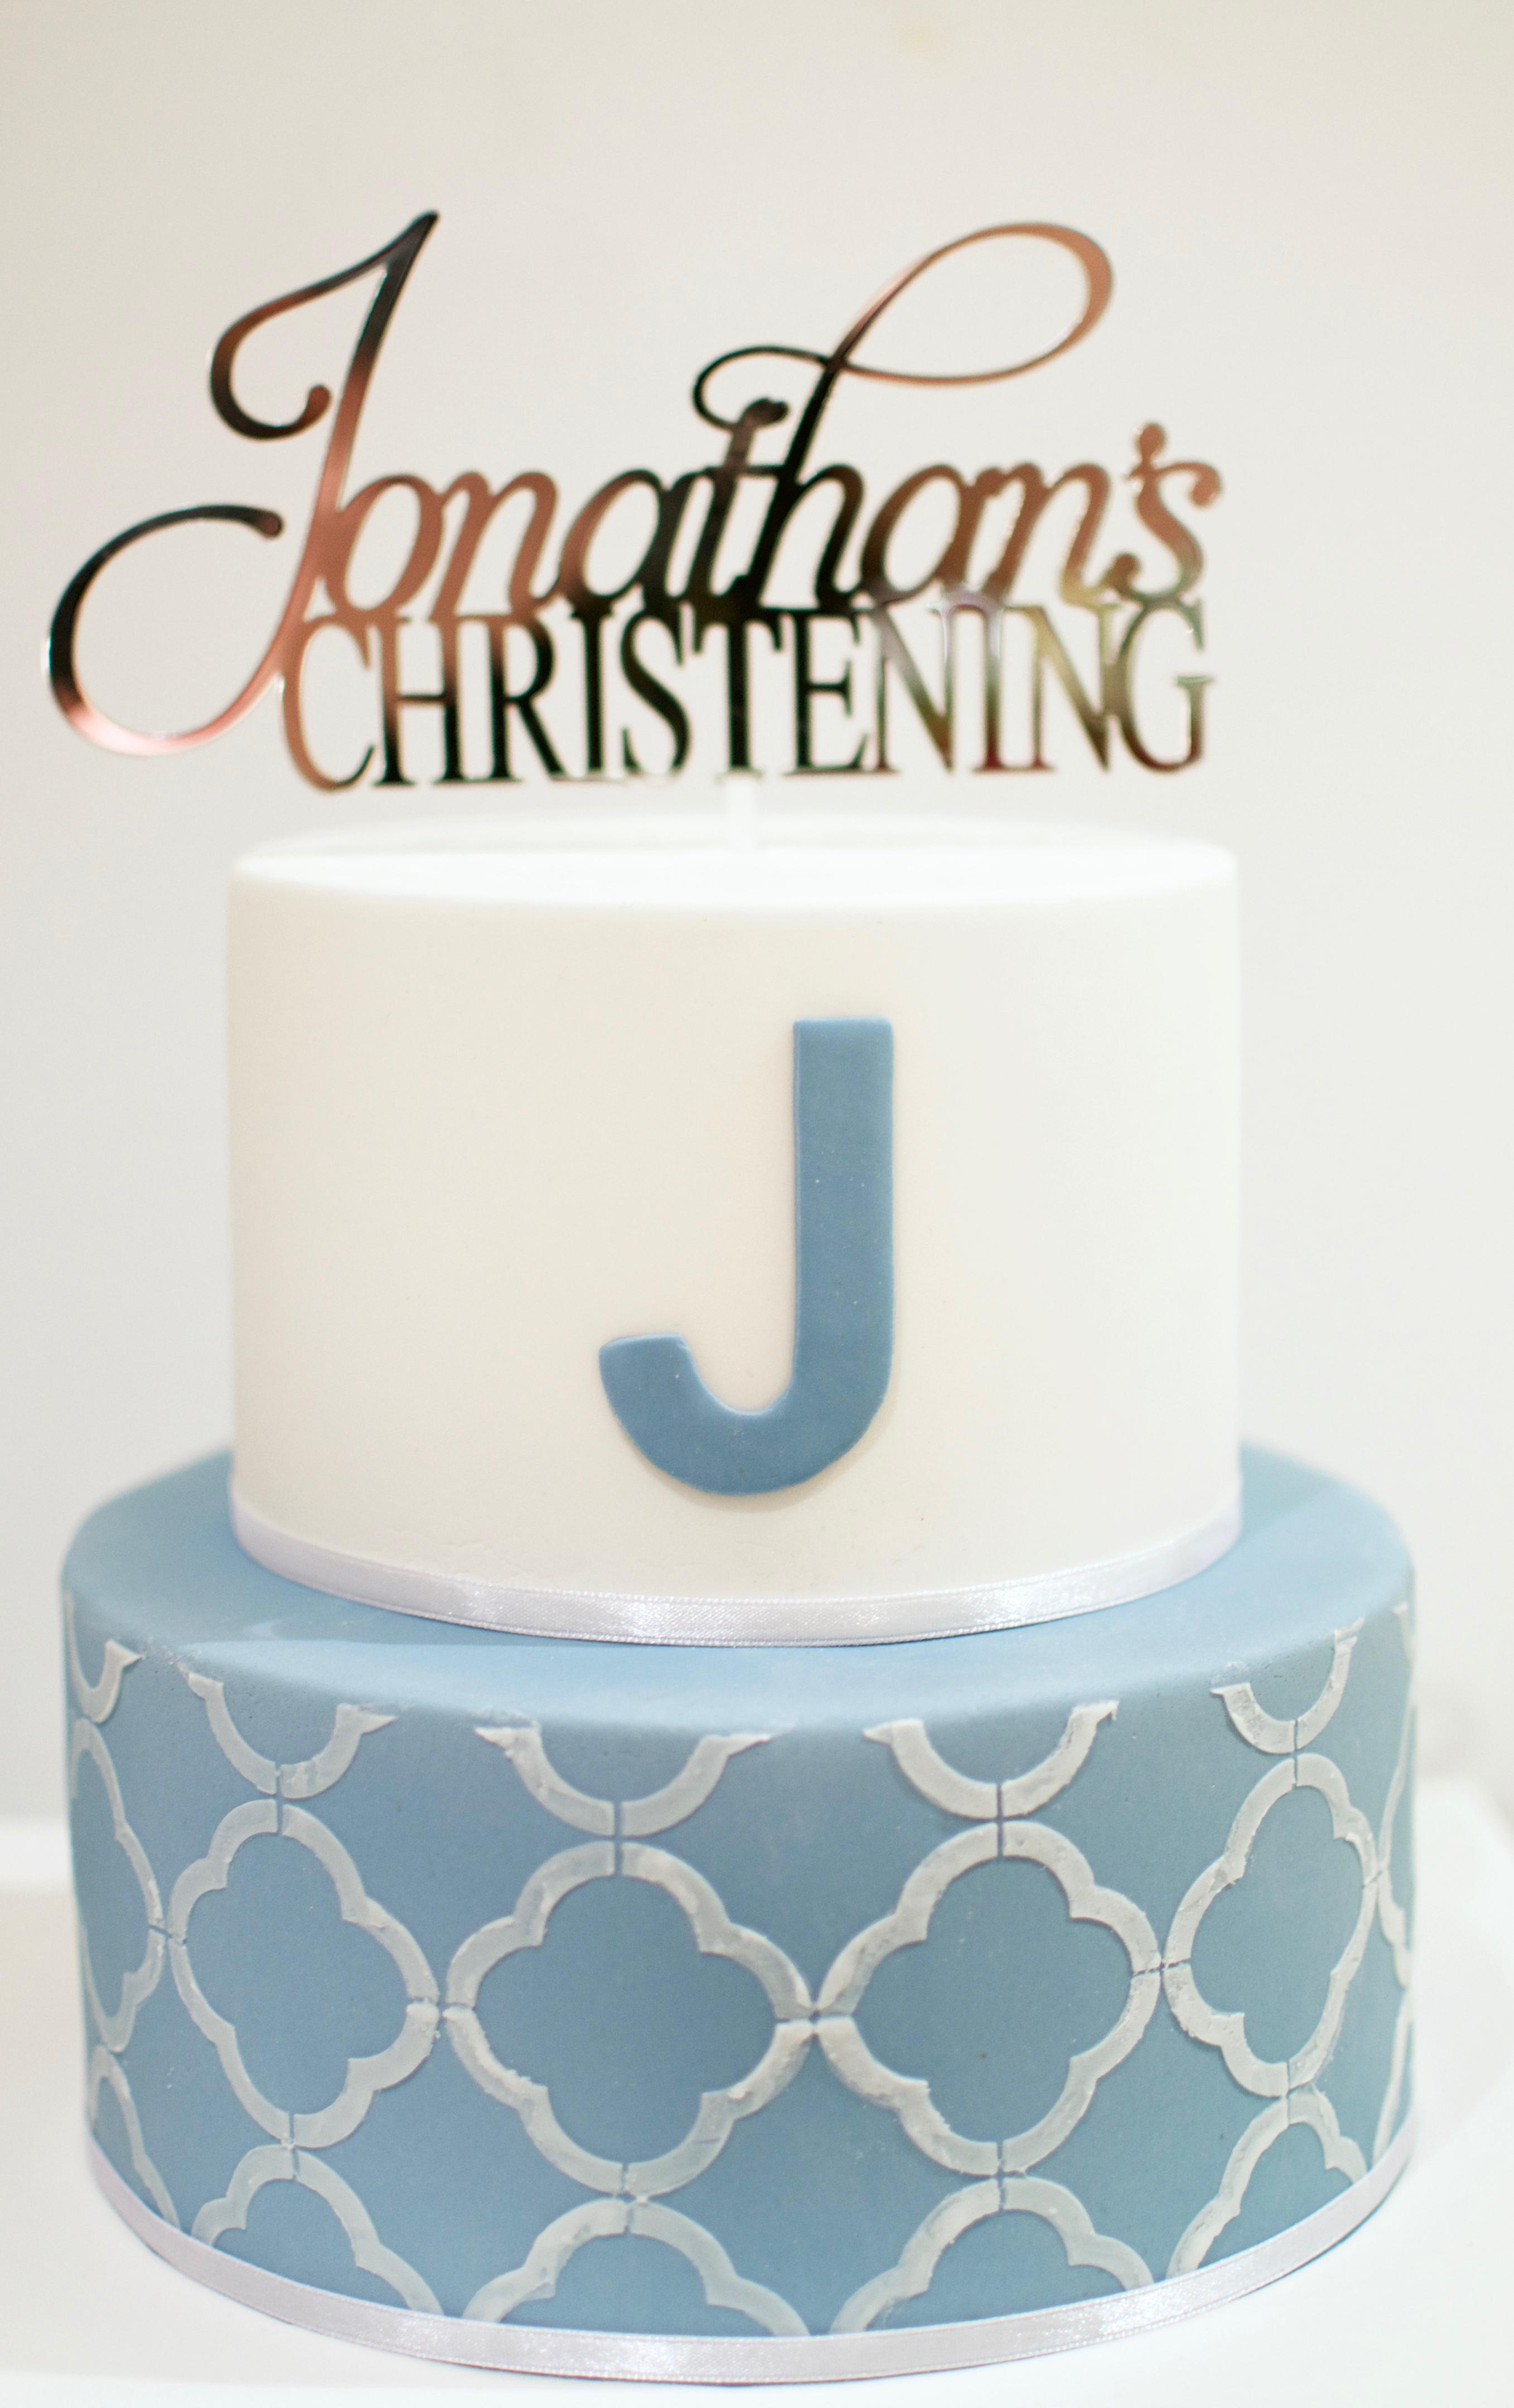 Christening Baptismal Cake